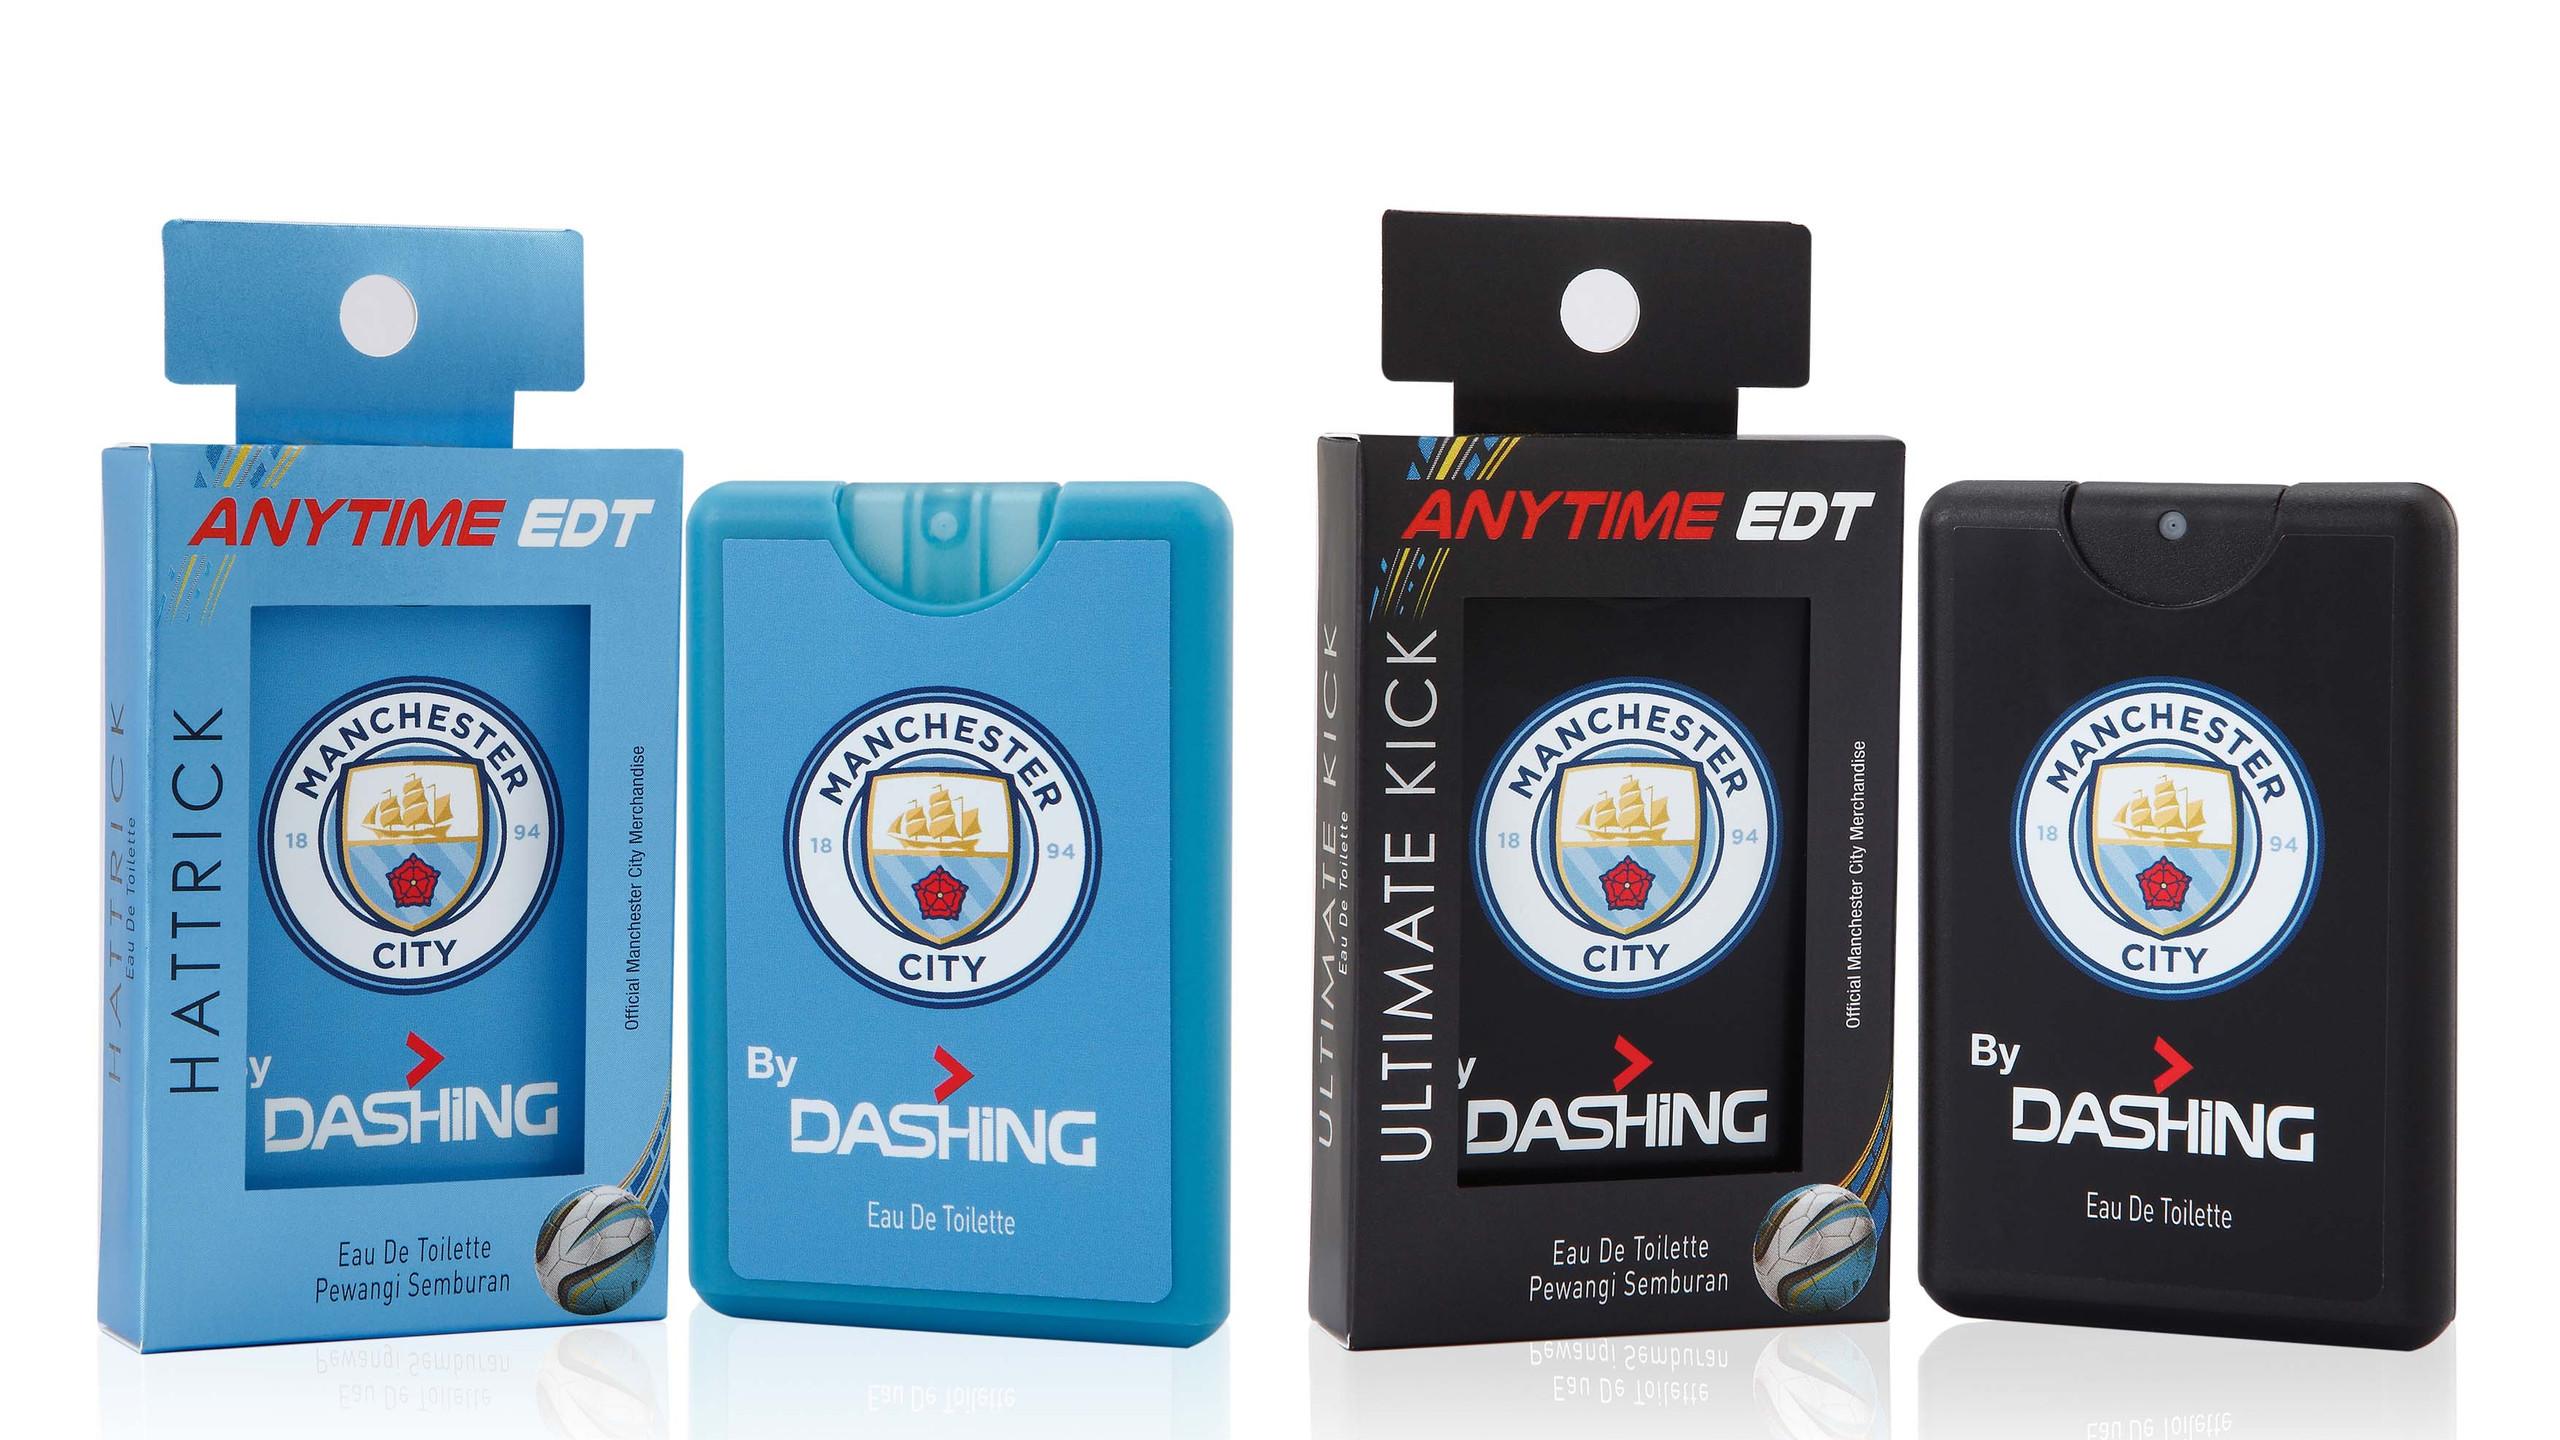 Dashing Anytime EDT Hattrick & Ultimate Kick Pack & Unit Box